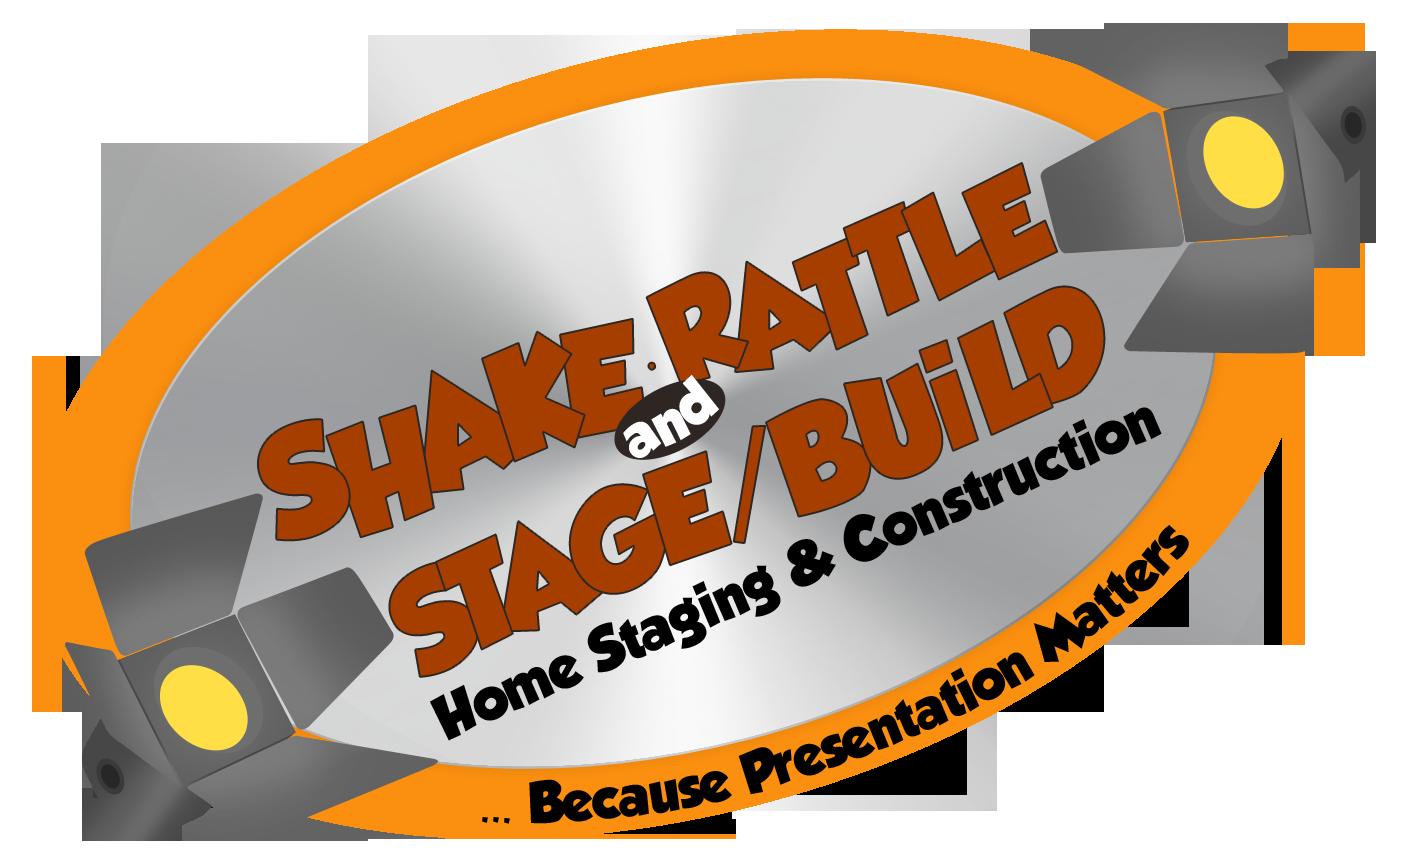 ShakeRatteStageBuild_Logo2.png